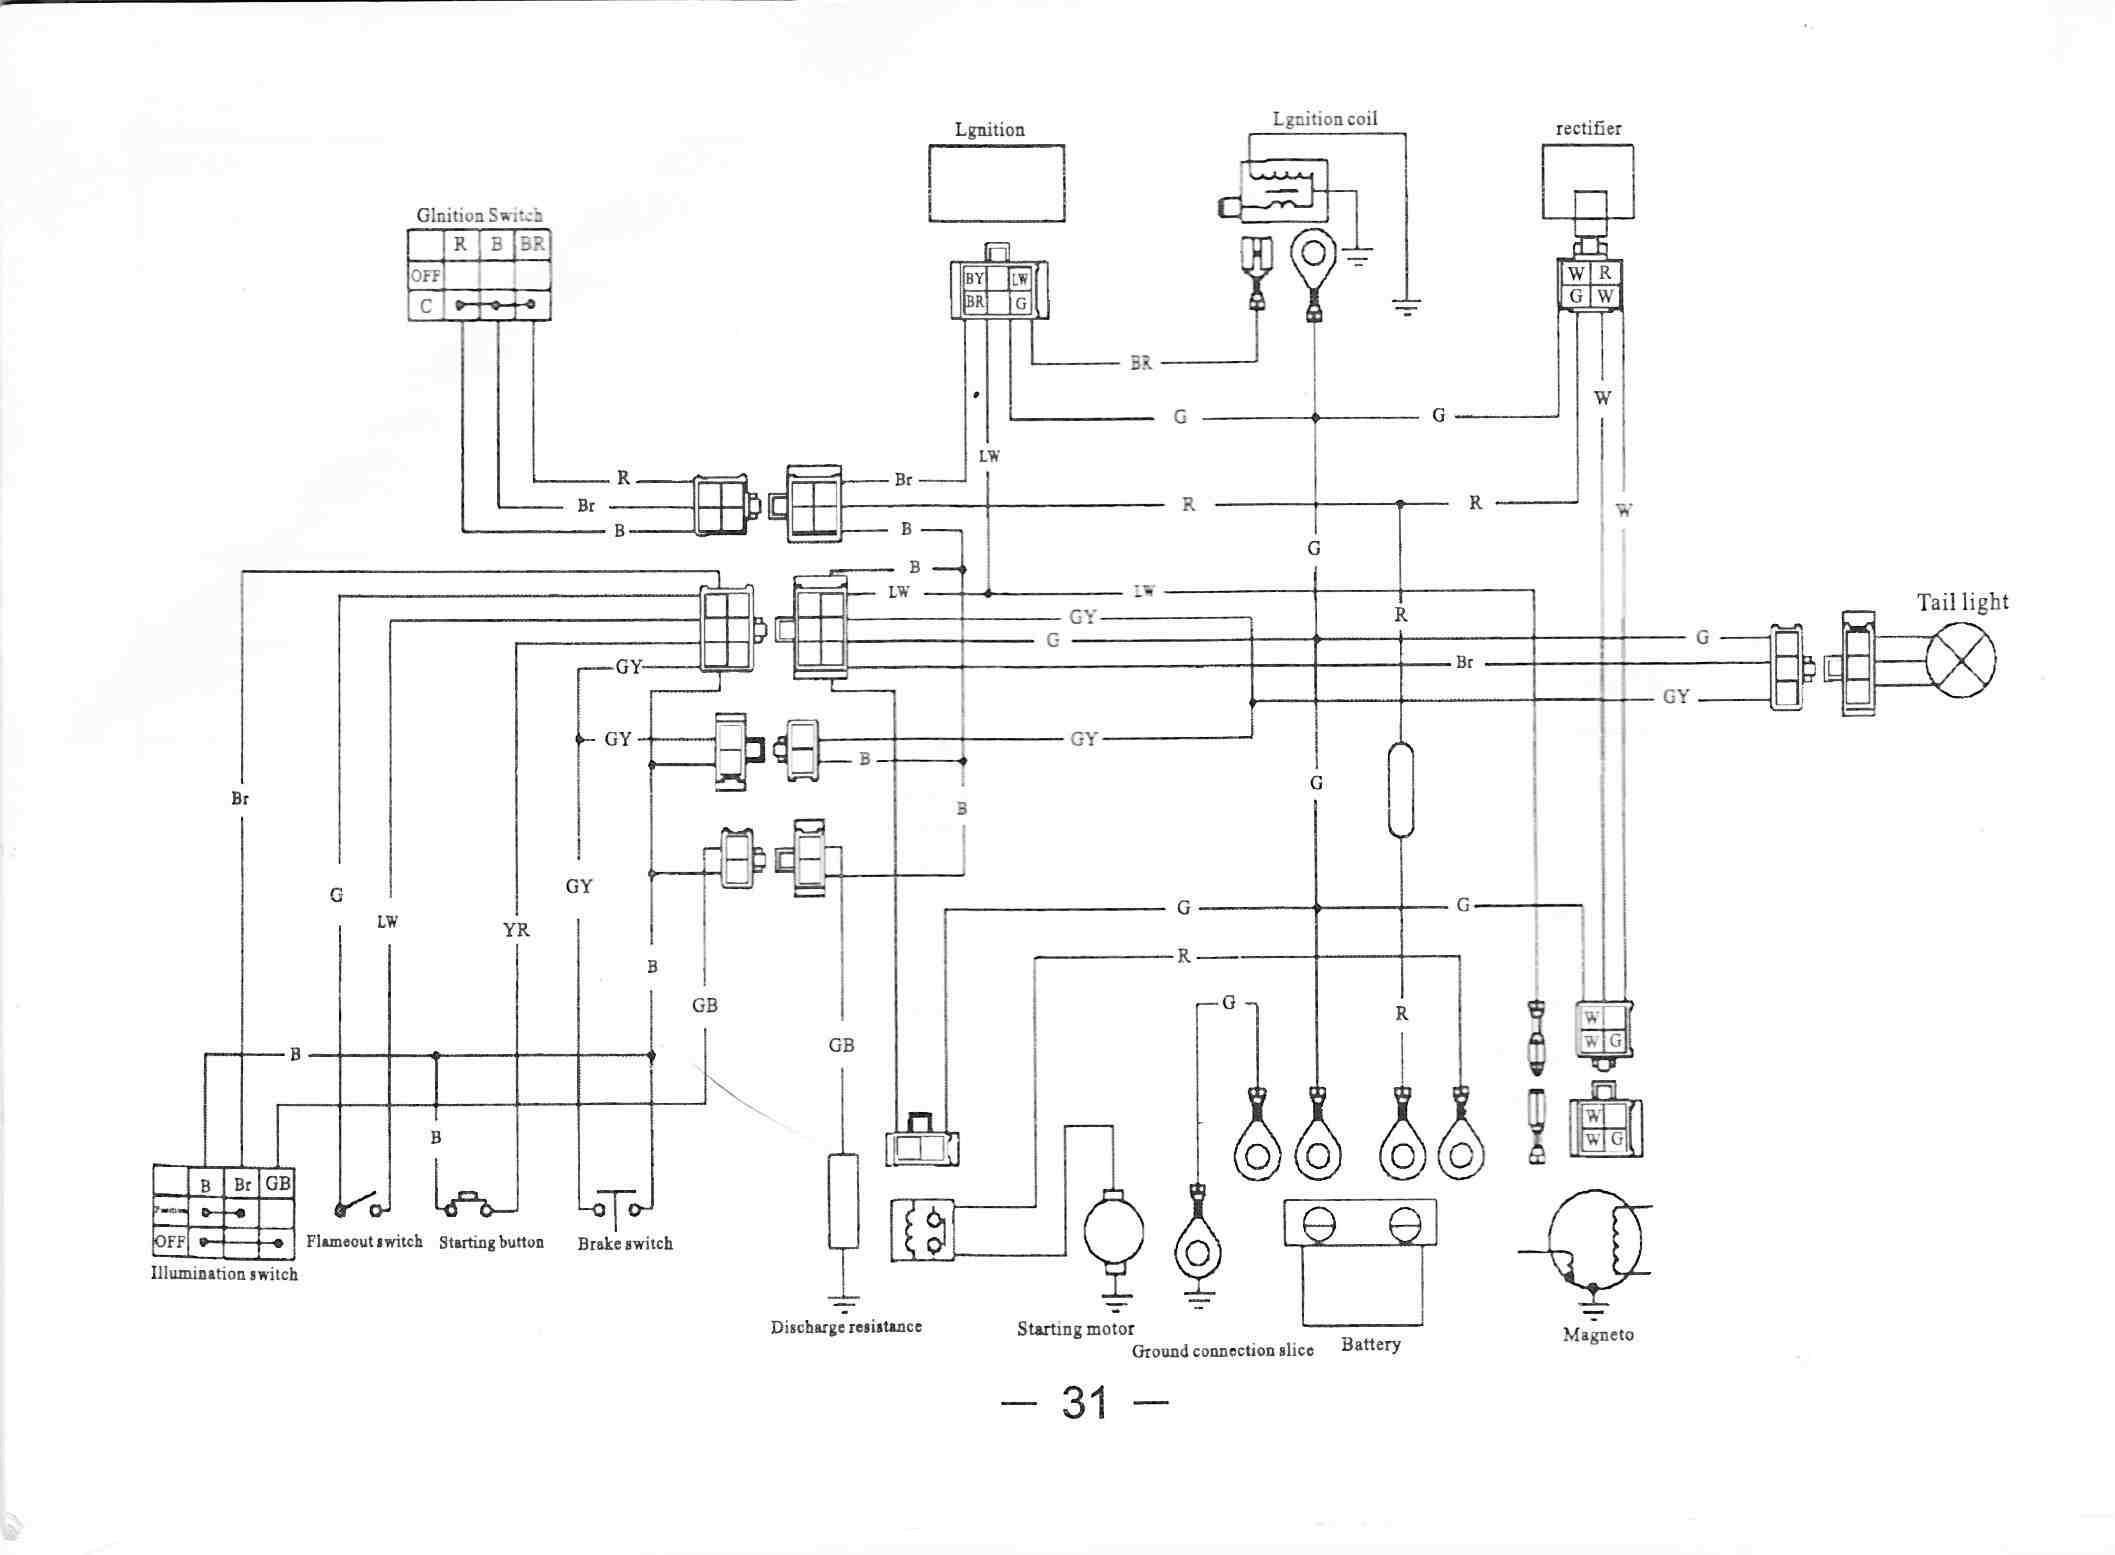 Yamaha 250 Atv Wiring Diagram - Wiring Diagram Schemas